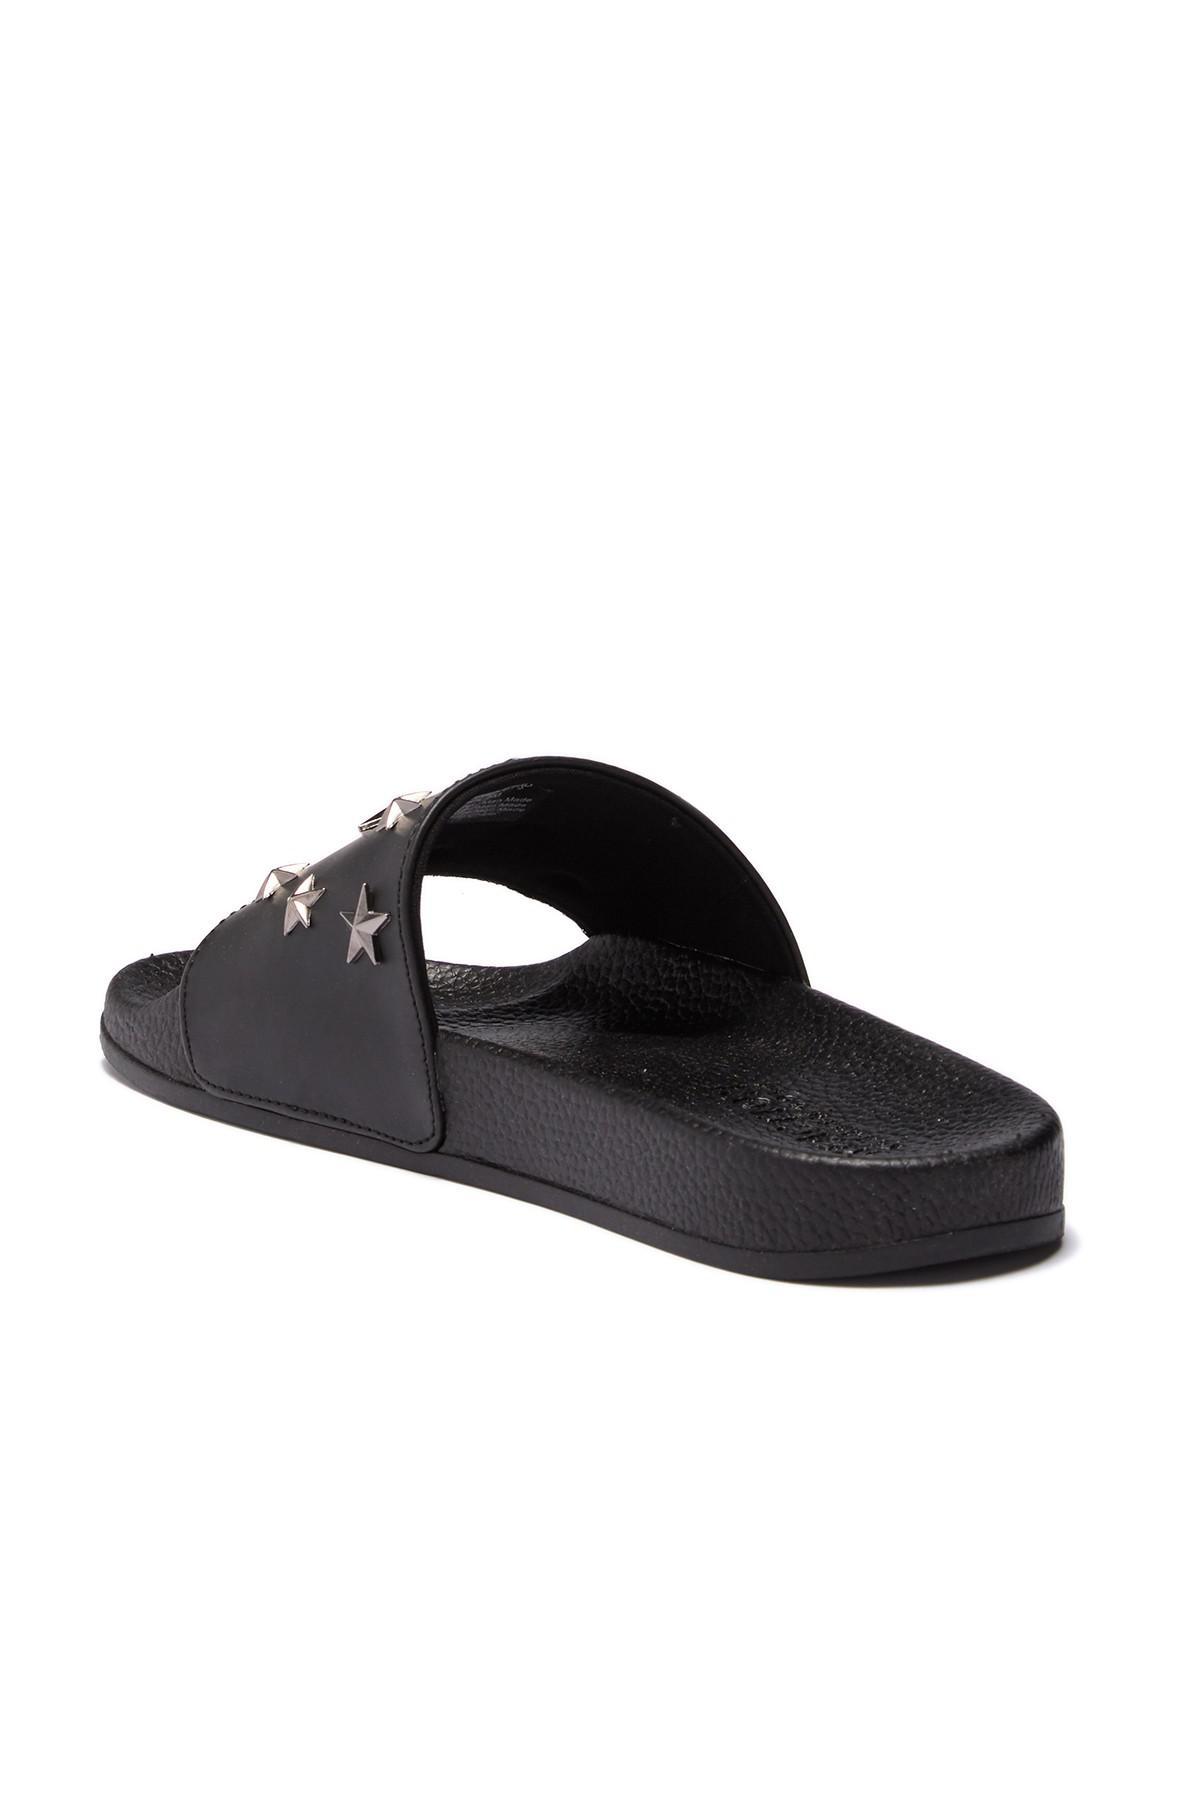 457747fa9d89 Lyst - Kenneth Cole Reaction Screen Stud Slide Sandal in Black for Men